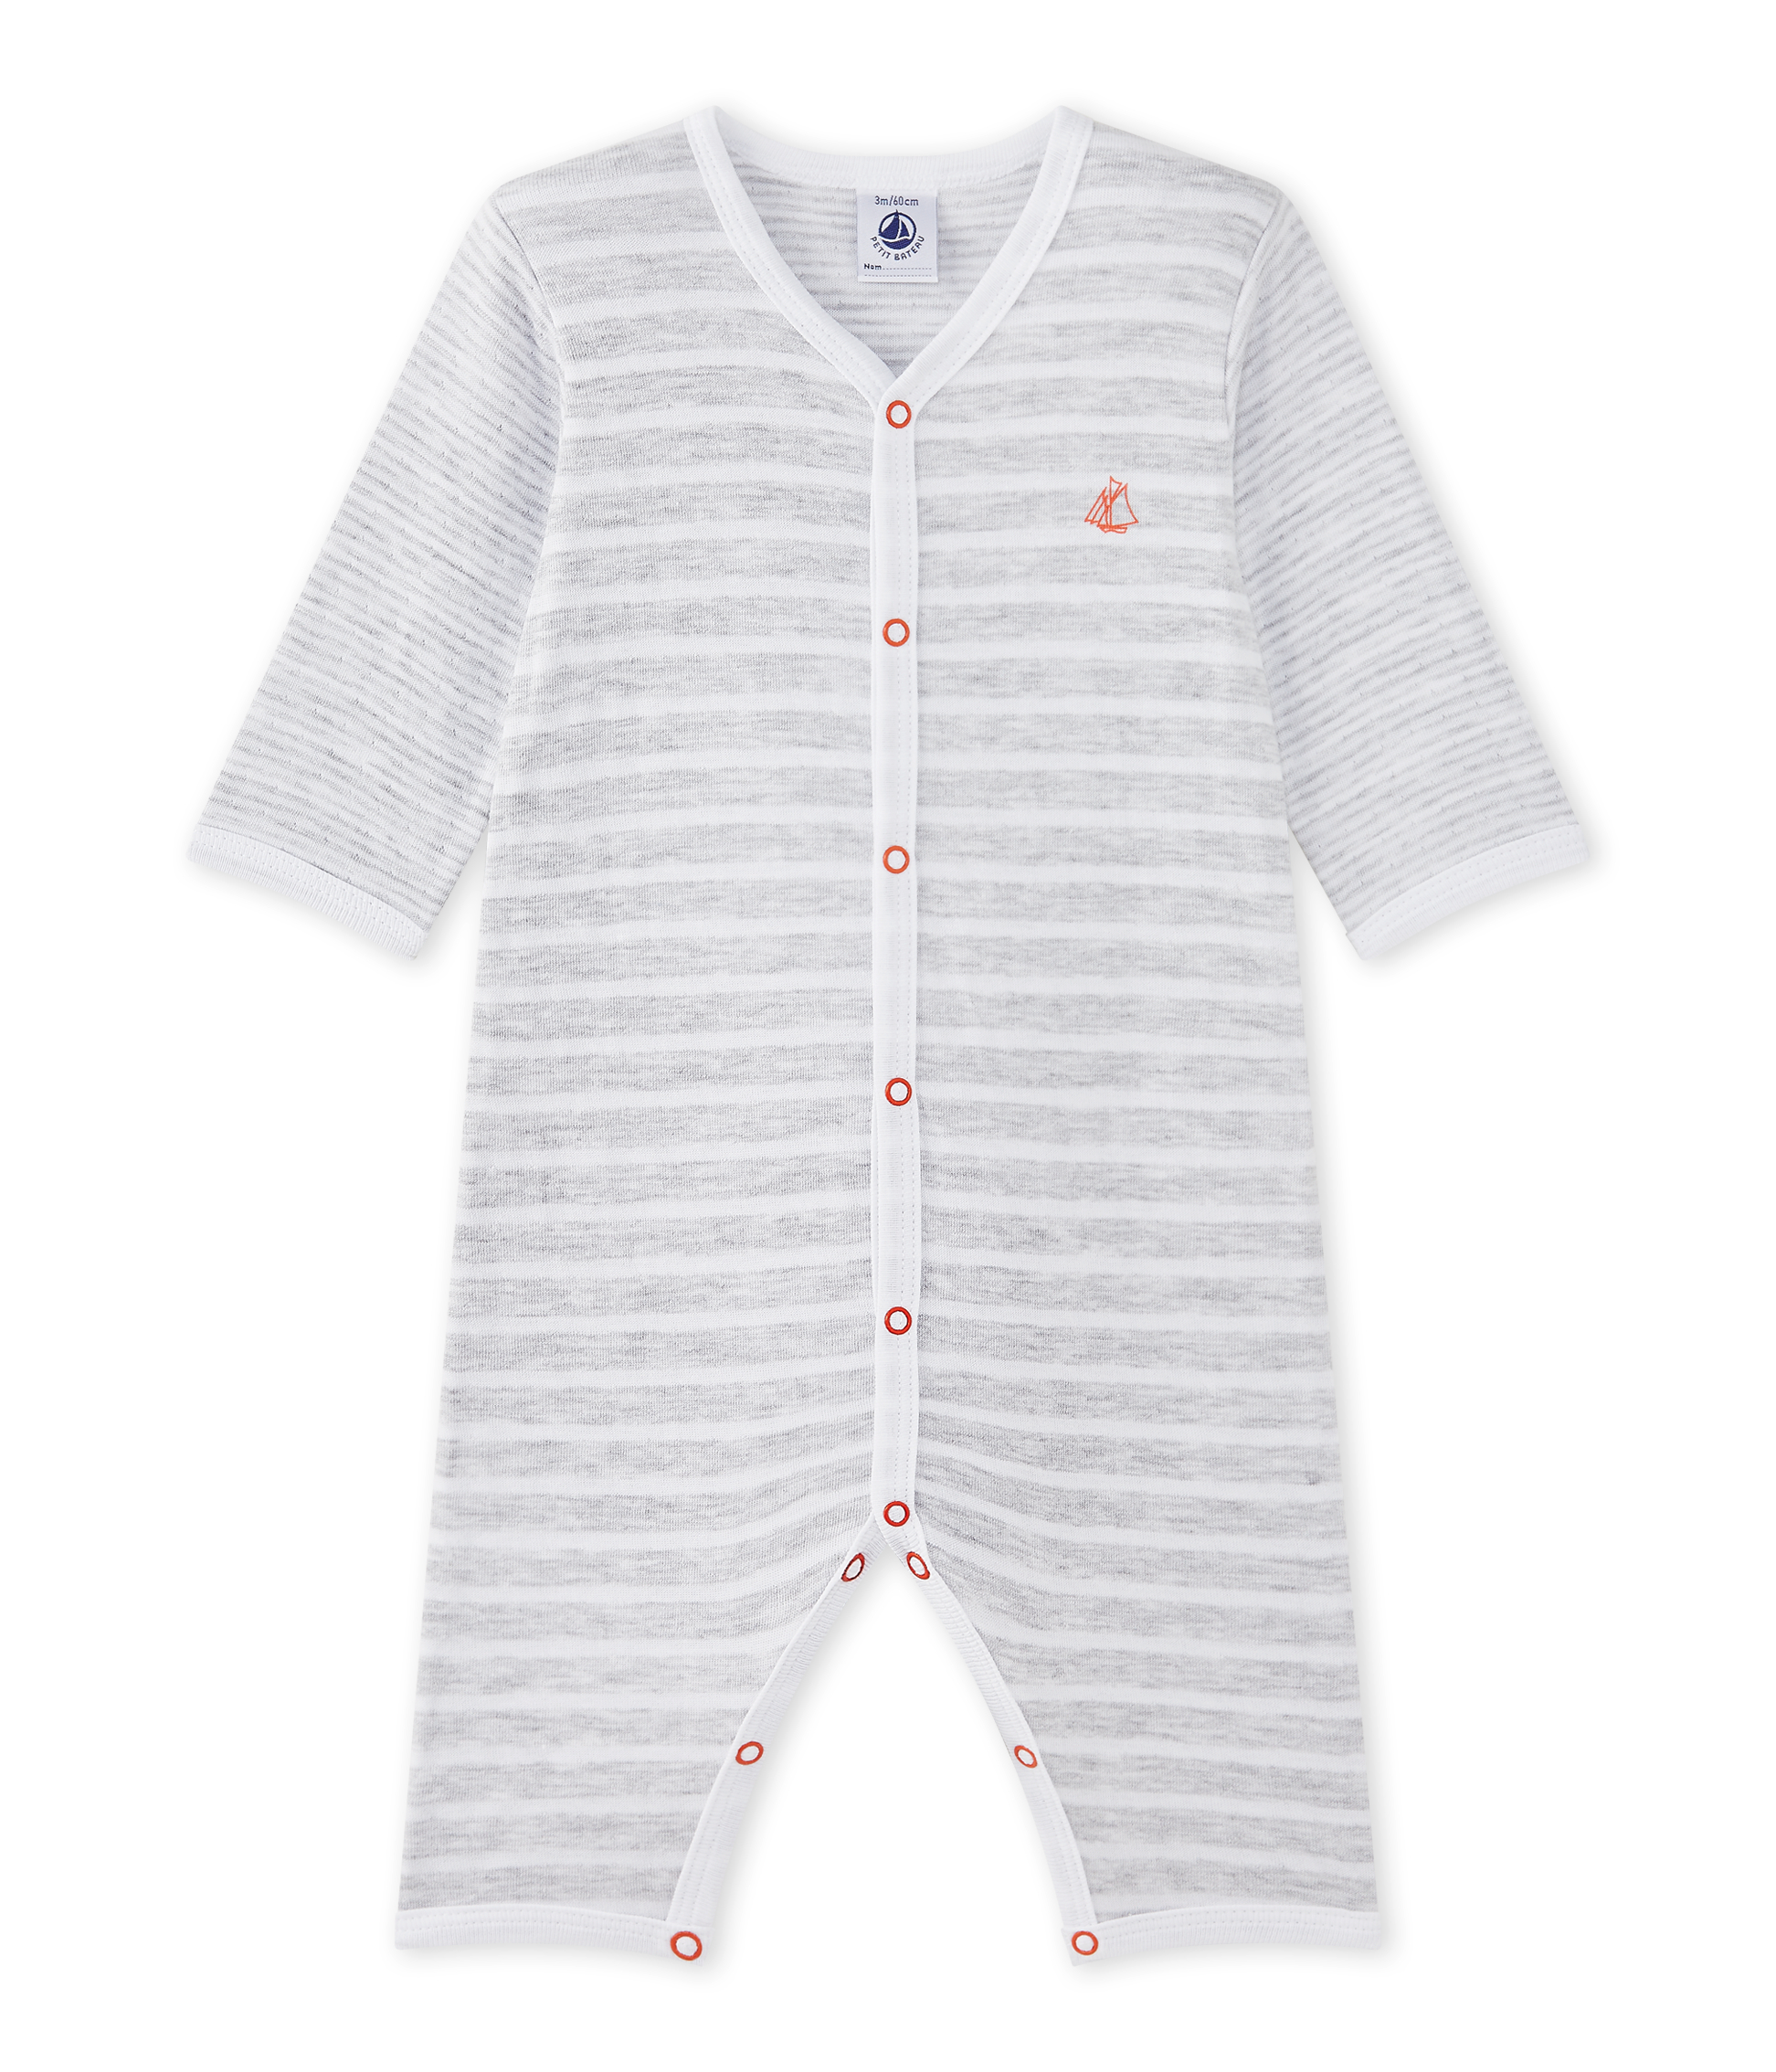 a295c3d1e Pijama sin pies para bebé niño | Petit Bateau